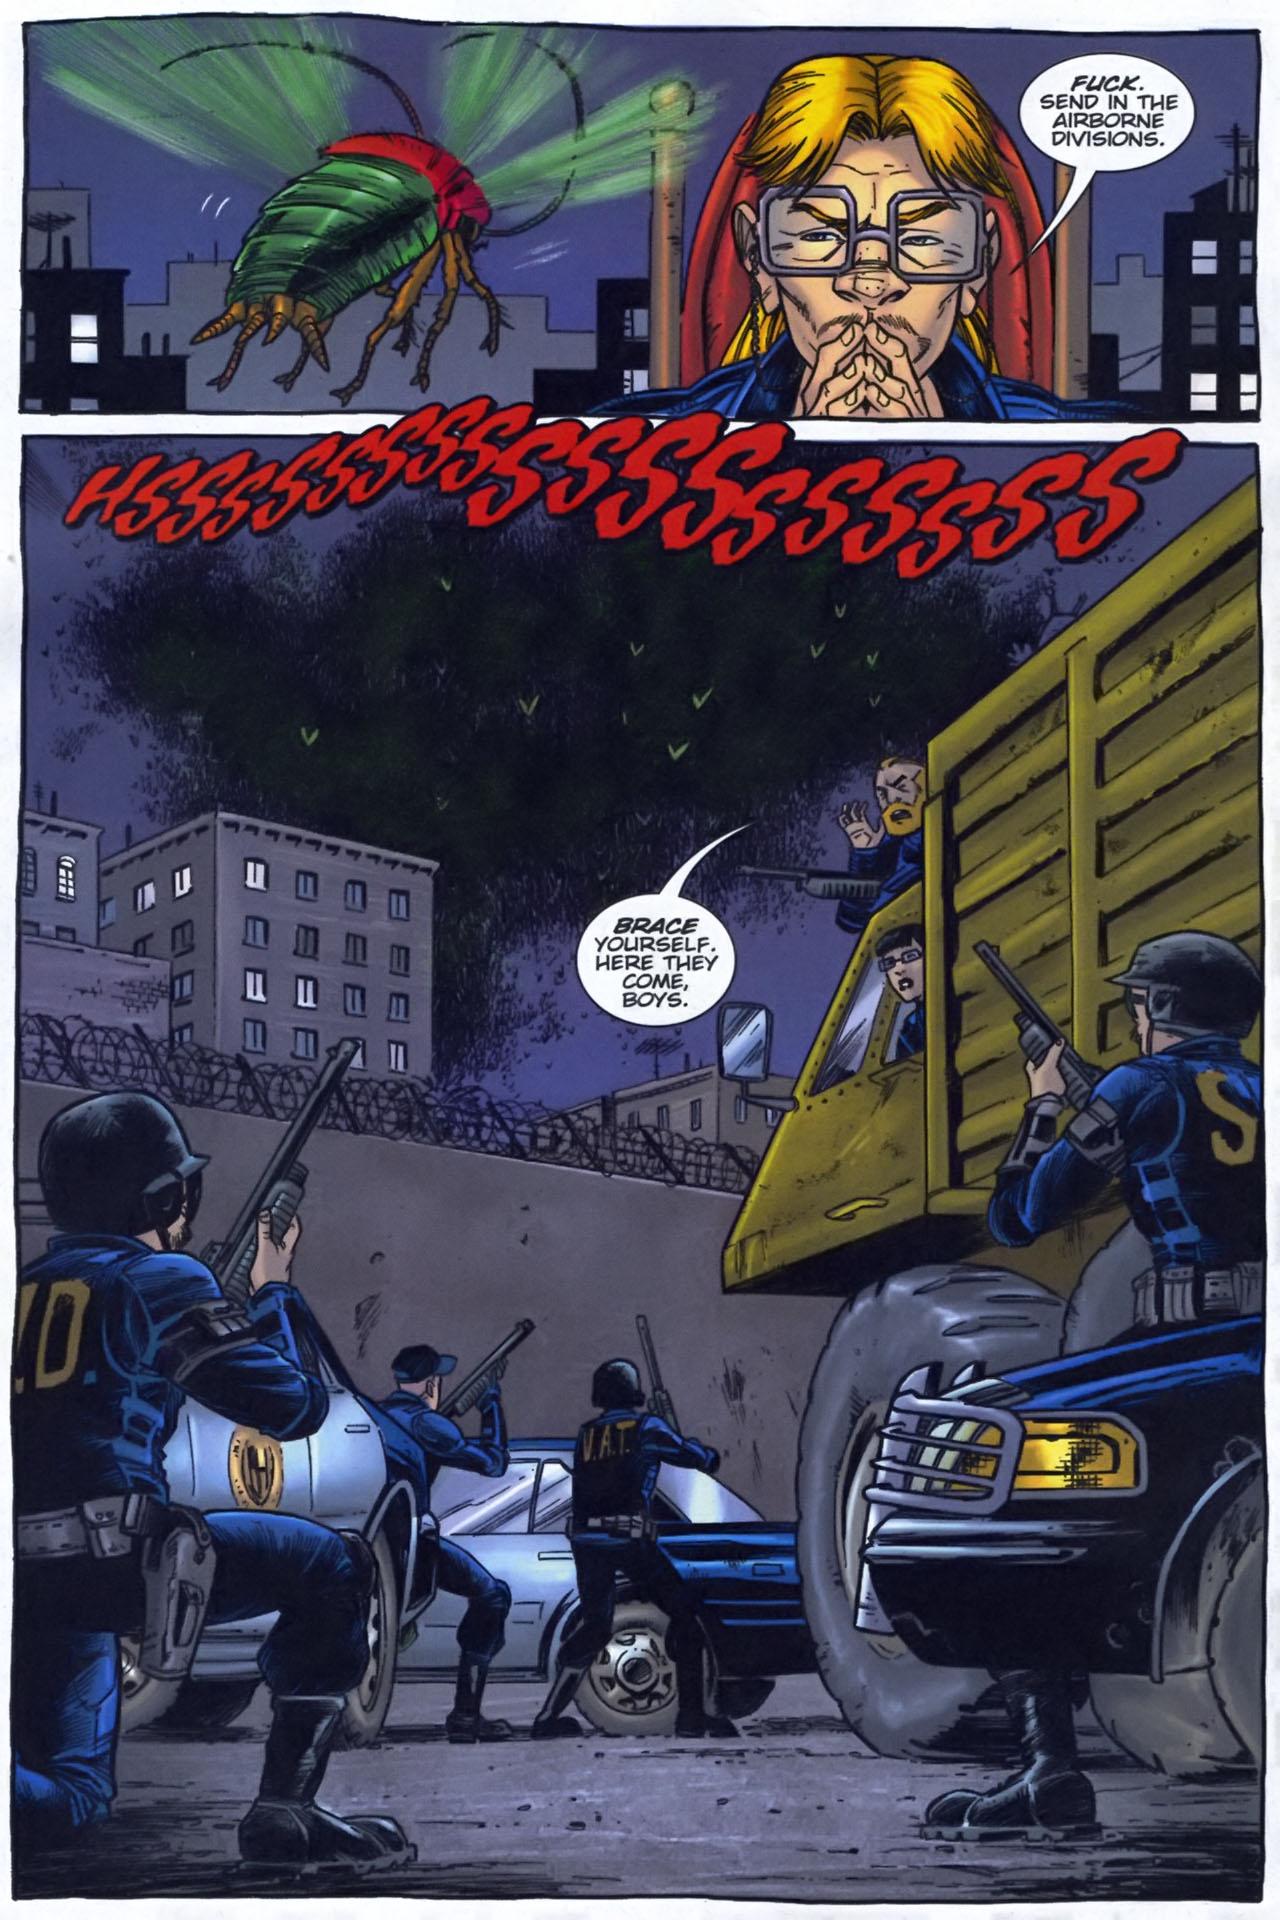 Read online The Exterminators comic -  Issue #29 - 18